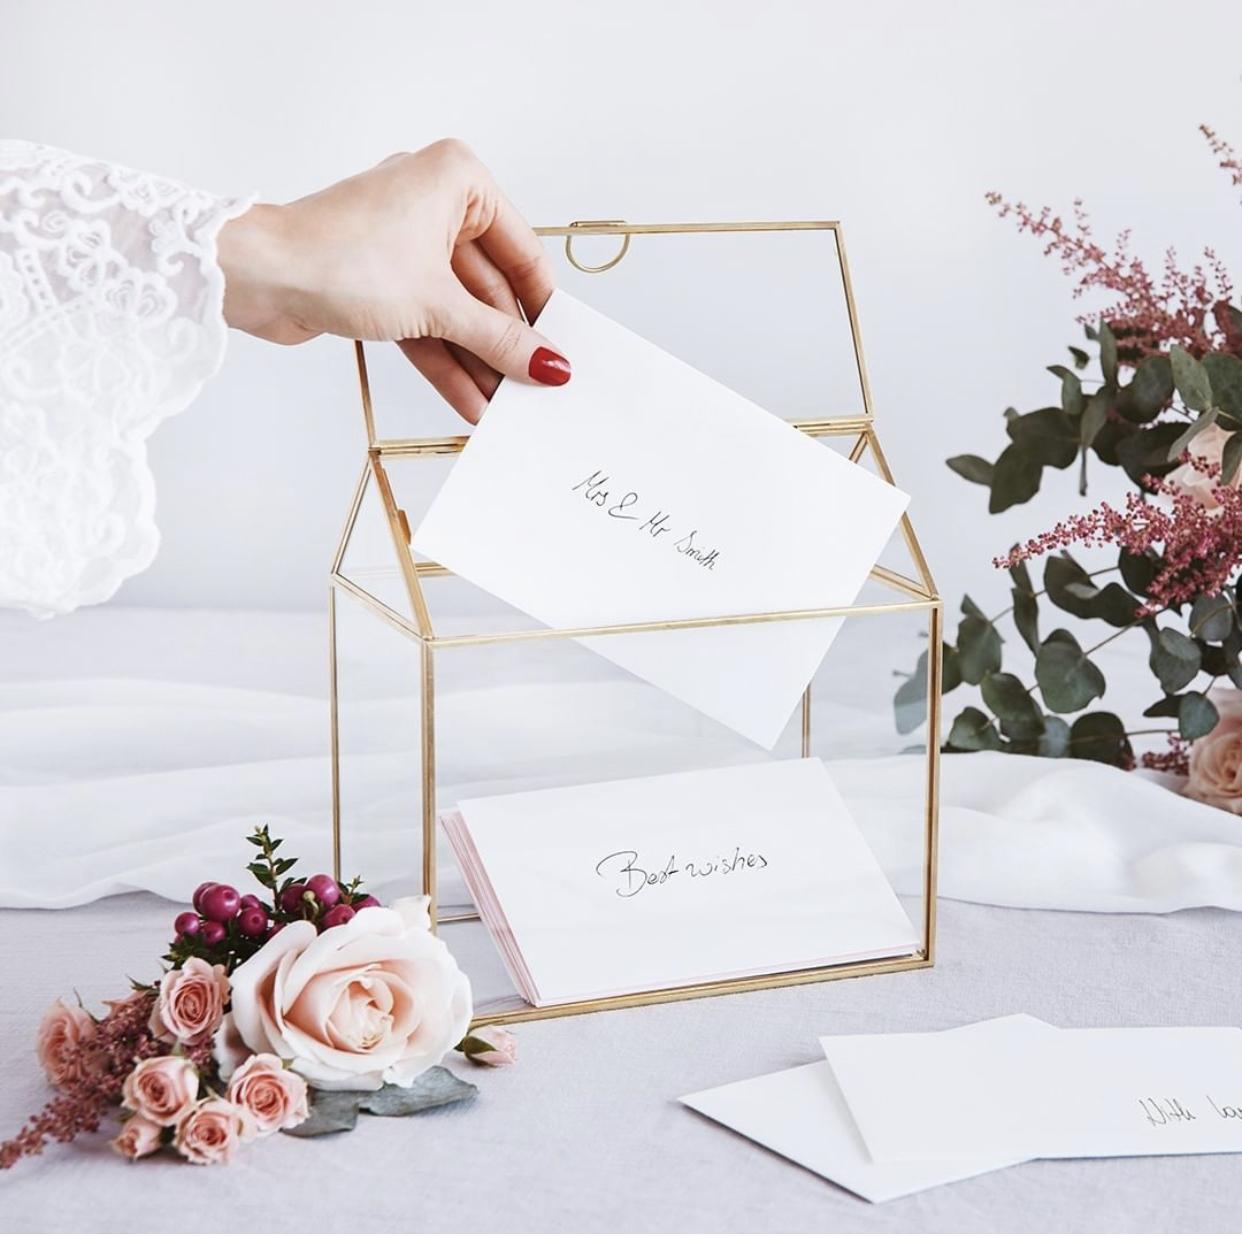 Svatební dekorace - Objednávka: www.svatebni-doplnky.cz